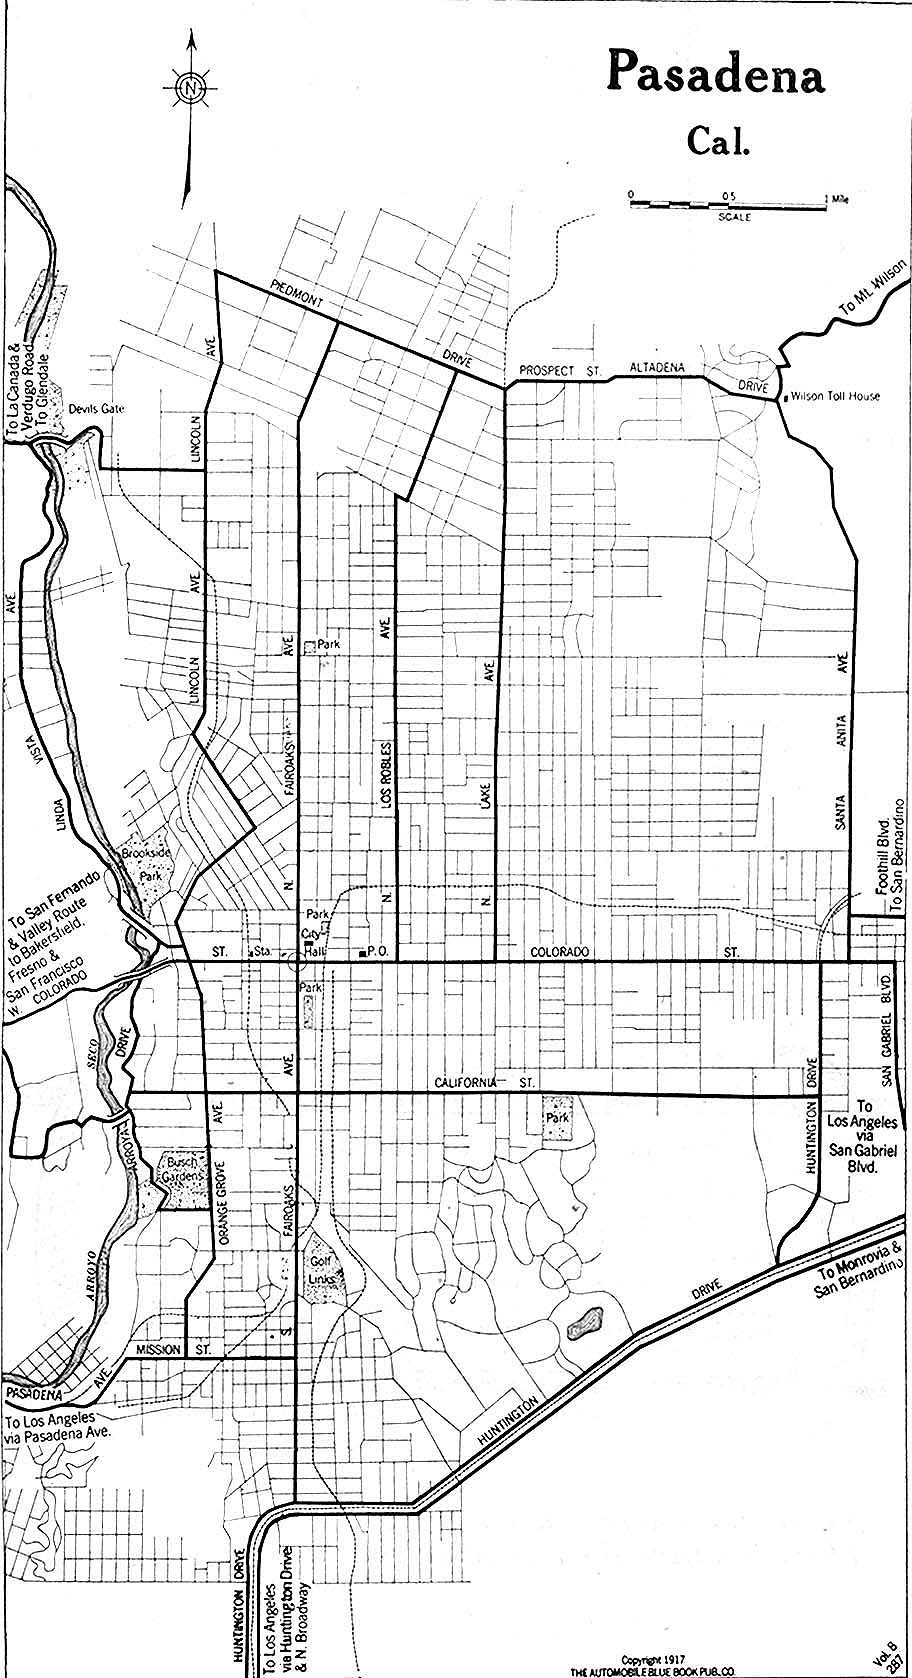 Pasadena City Map, California, United States 1917